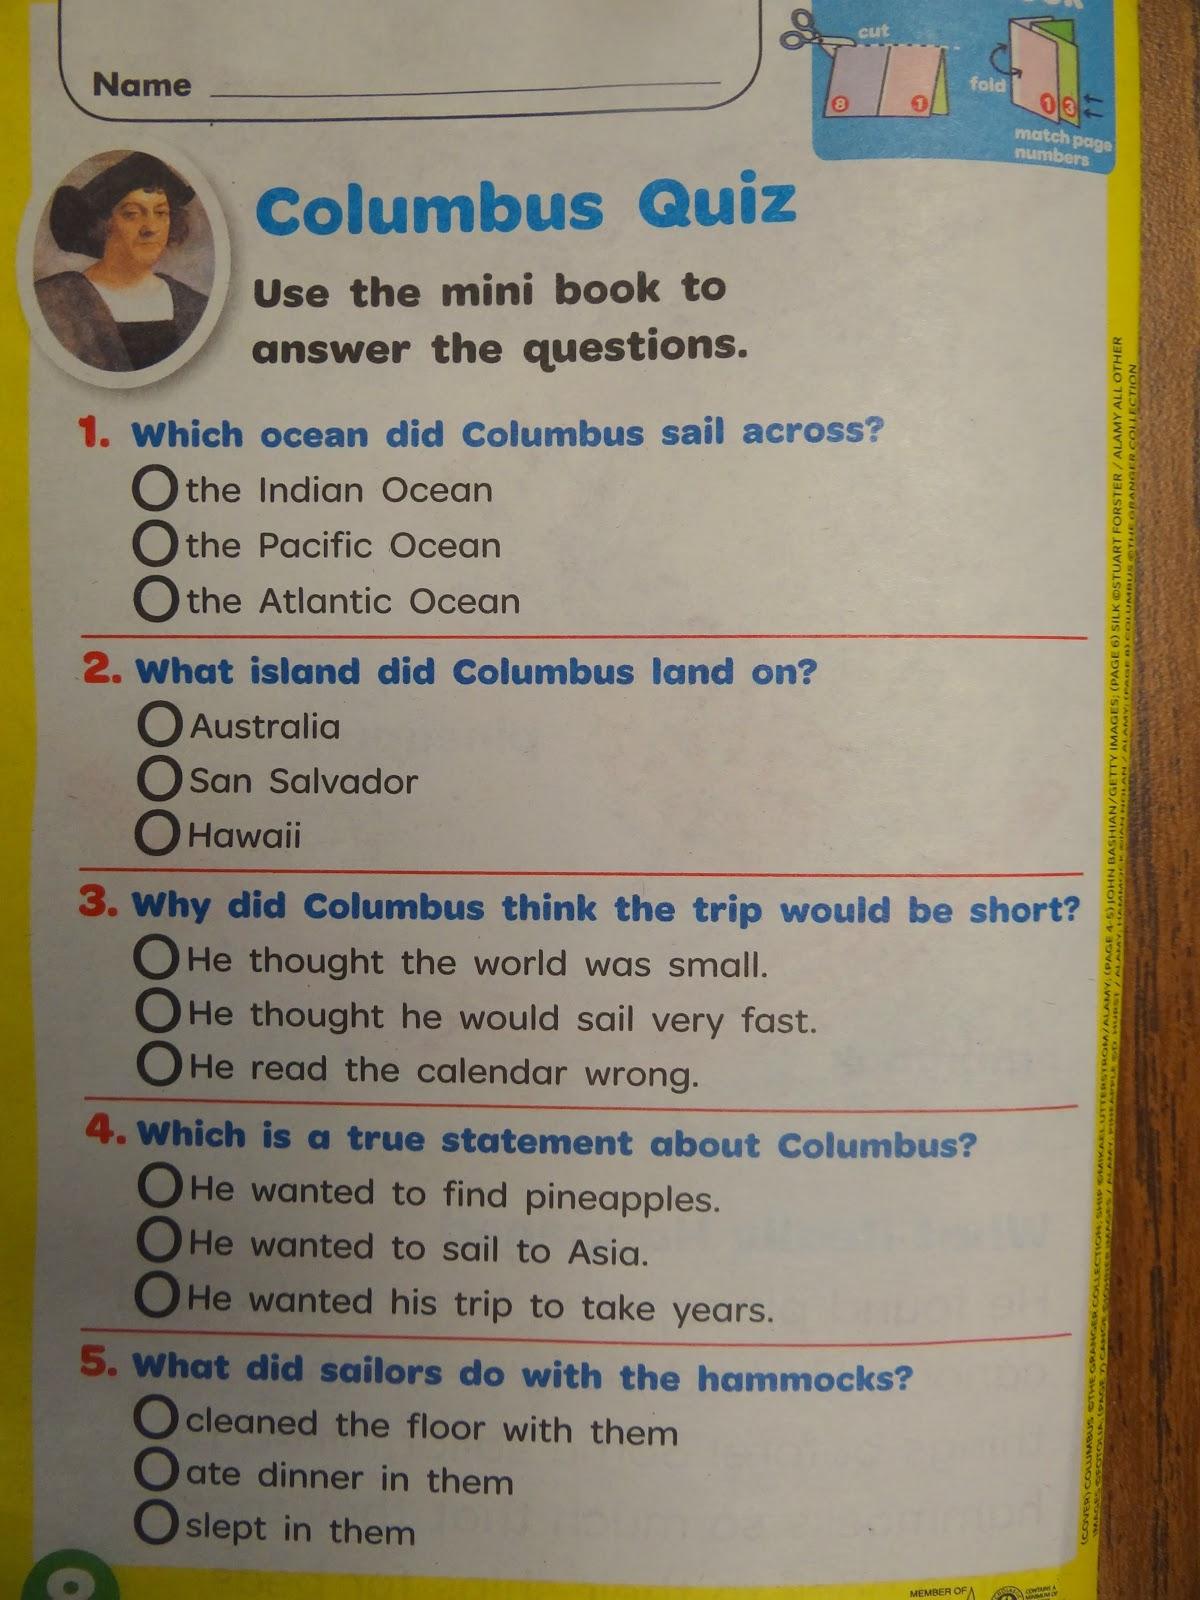 Patties classroom christopher columbus activities a columbus quiz from the weekly readerscholastic news ibookread Download